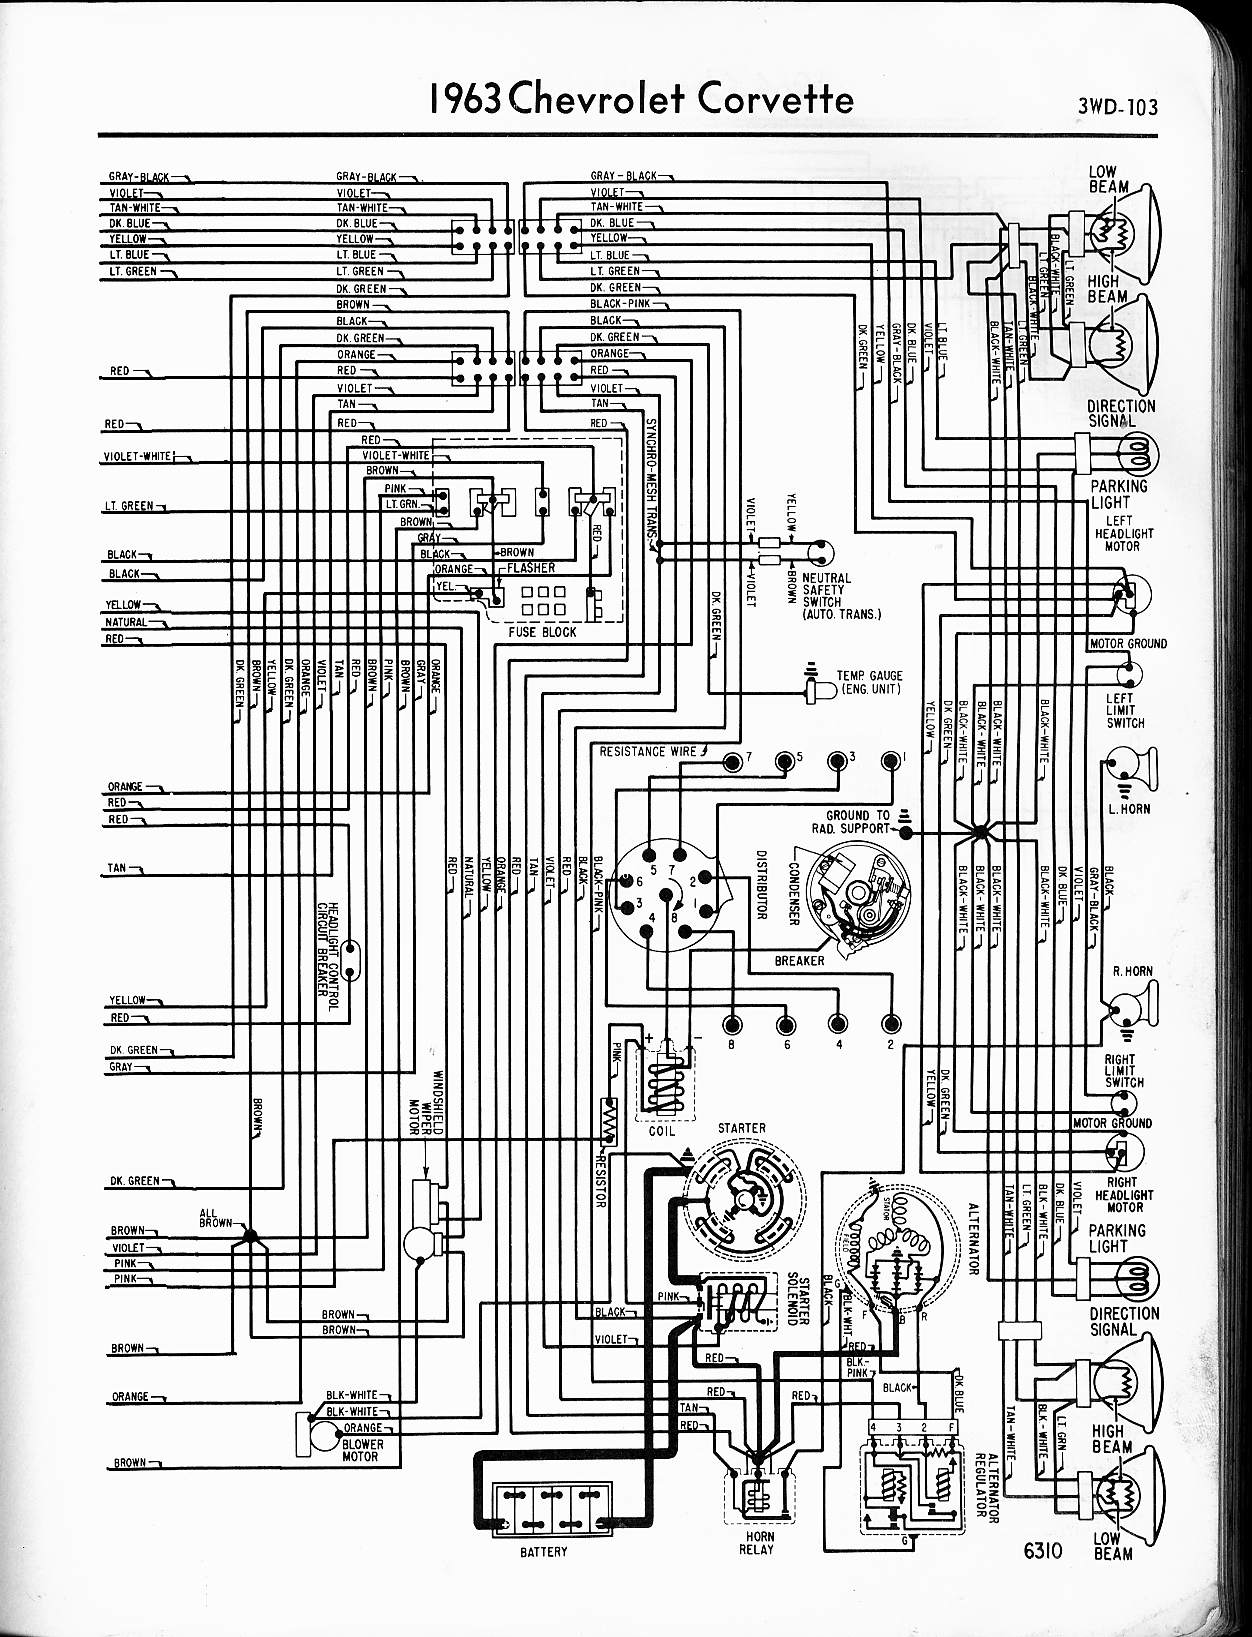 1984 Corvette Gauge Cluster Wiring Diagram Schematic Wiring Diagram Camaro B Camaro B Graniantichiumbri It